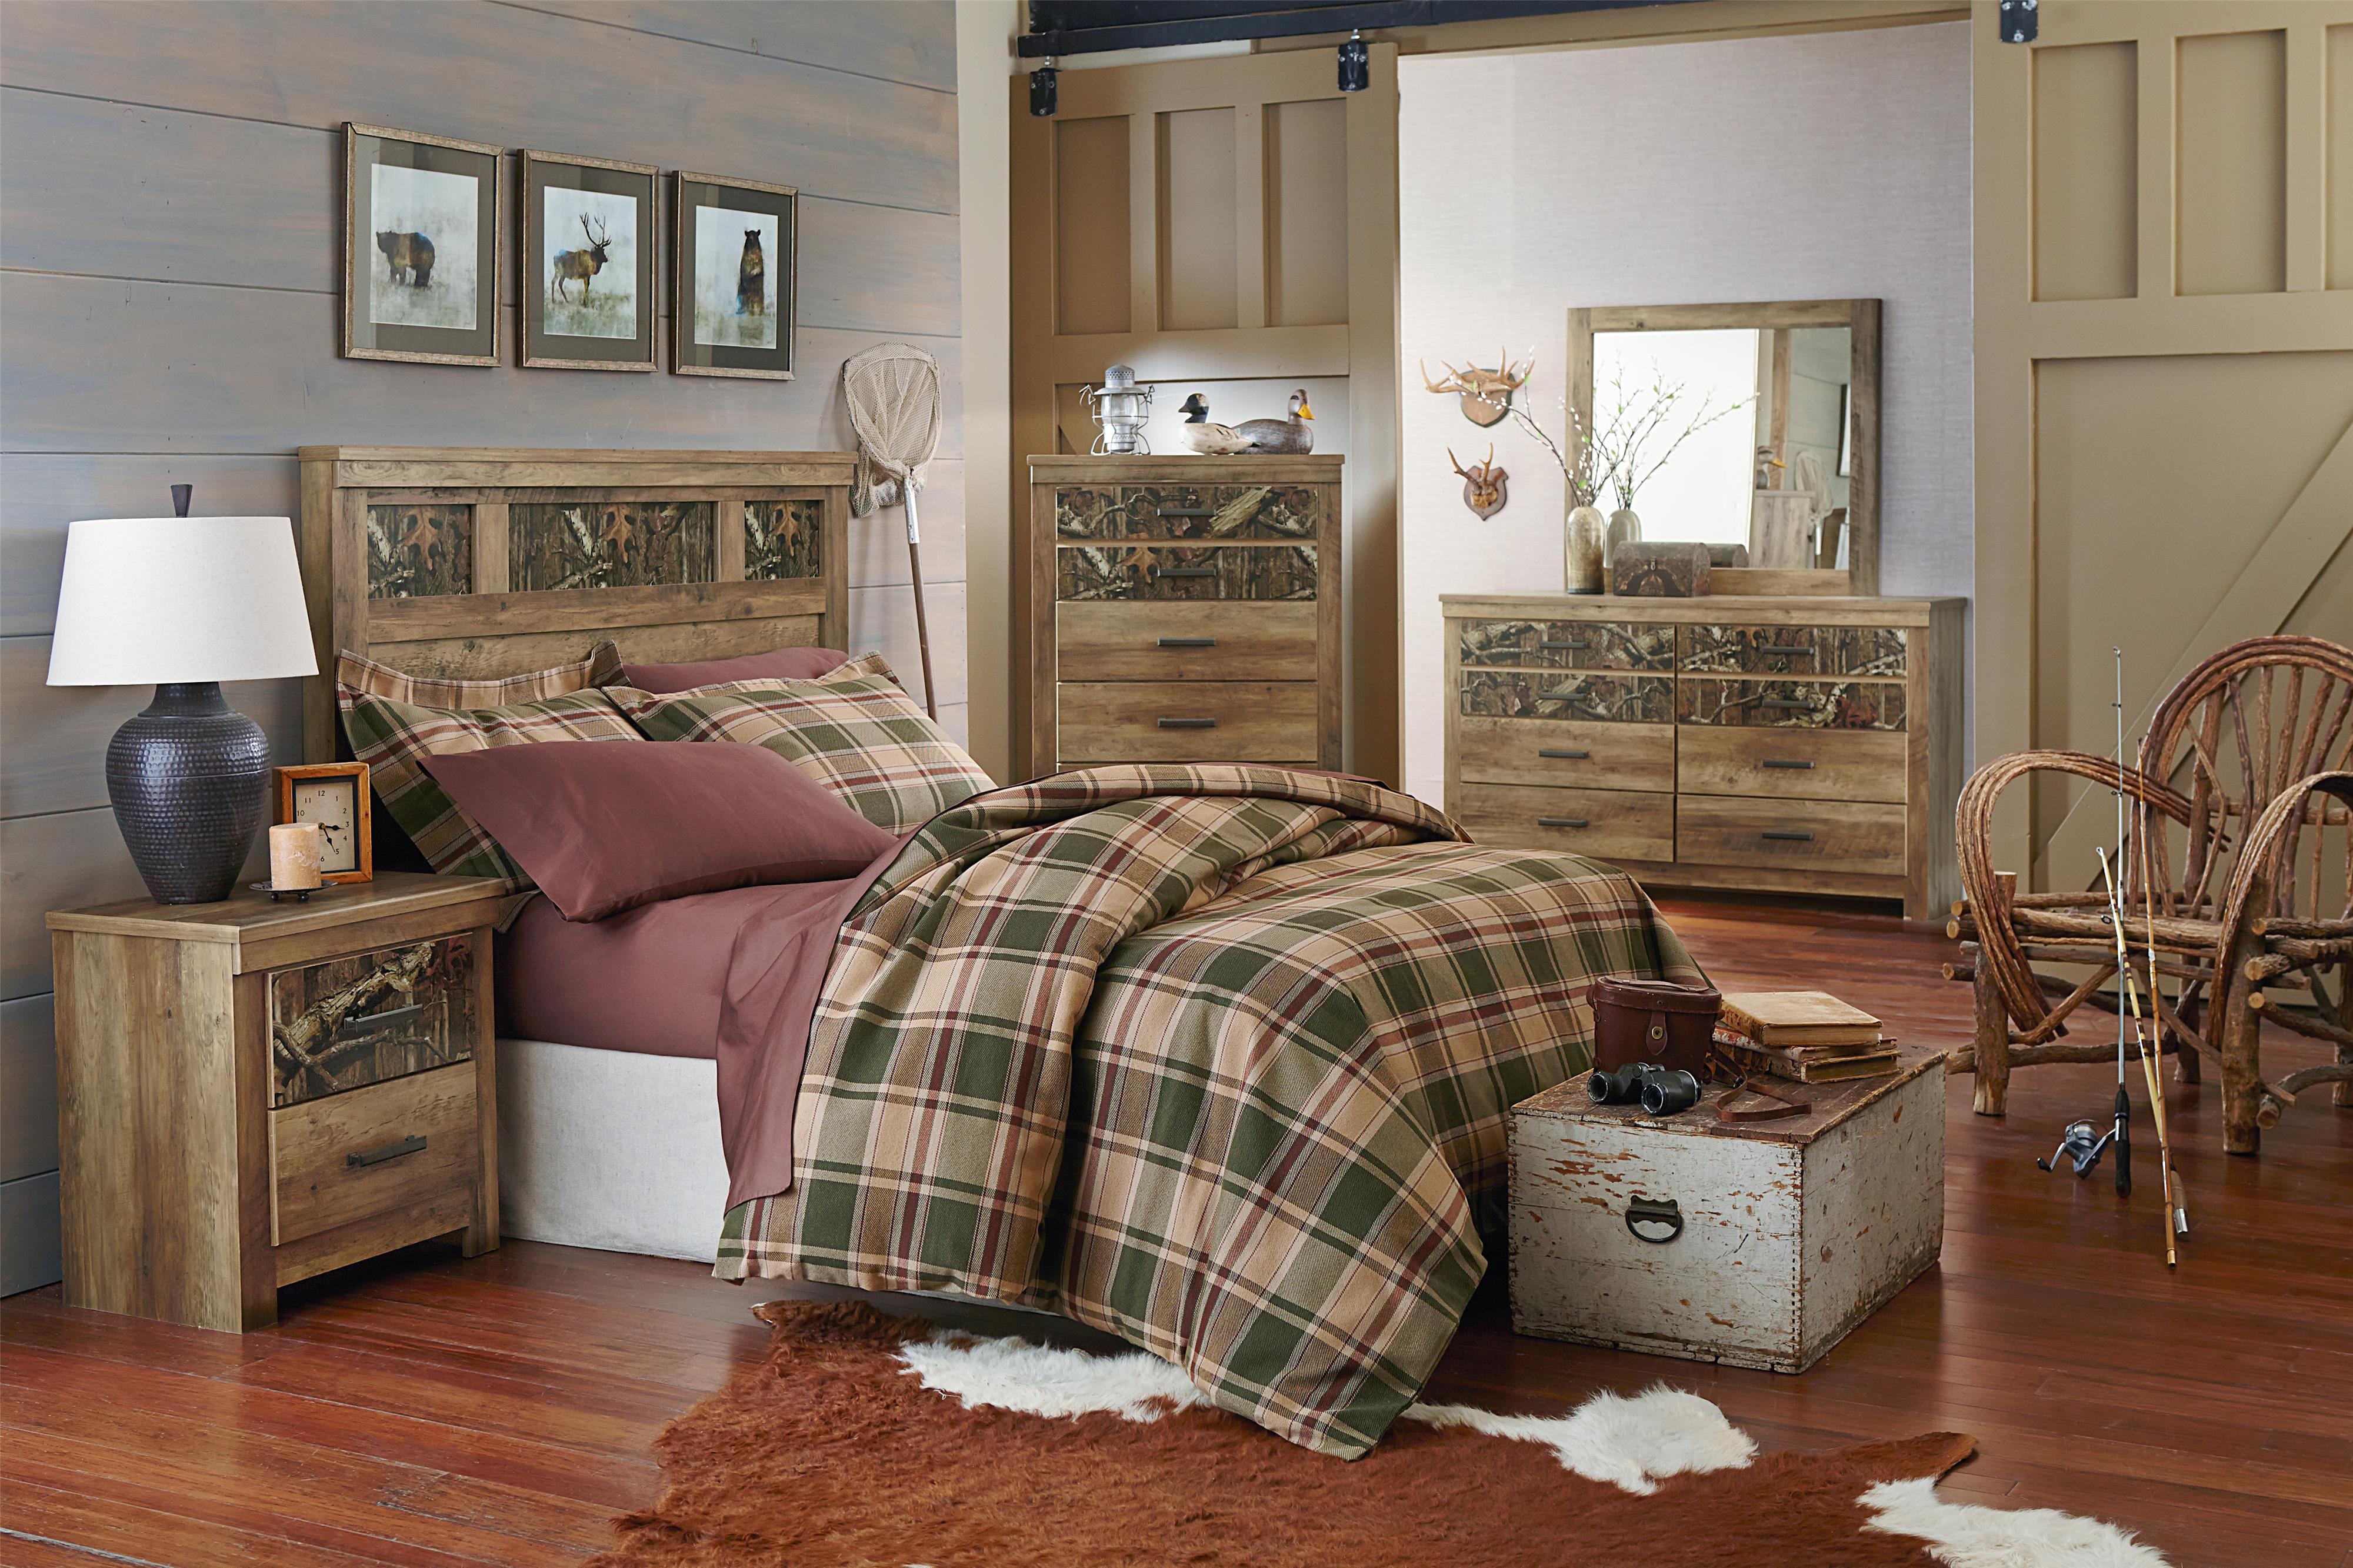 Standard Furniture Habitat Full/Queen Bedroom Group - Item Number: 55450 FQ Bedroom Group 1